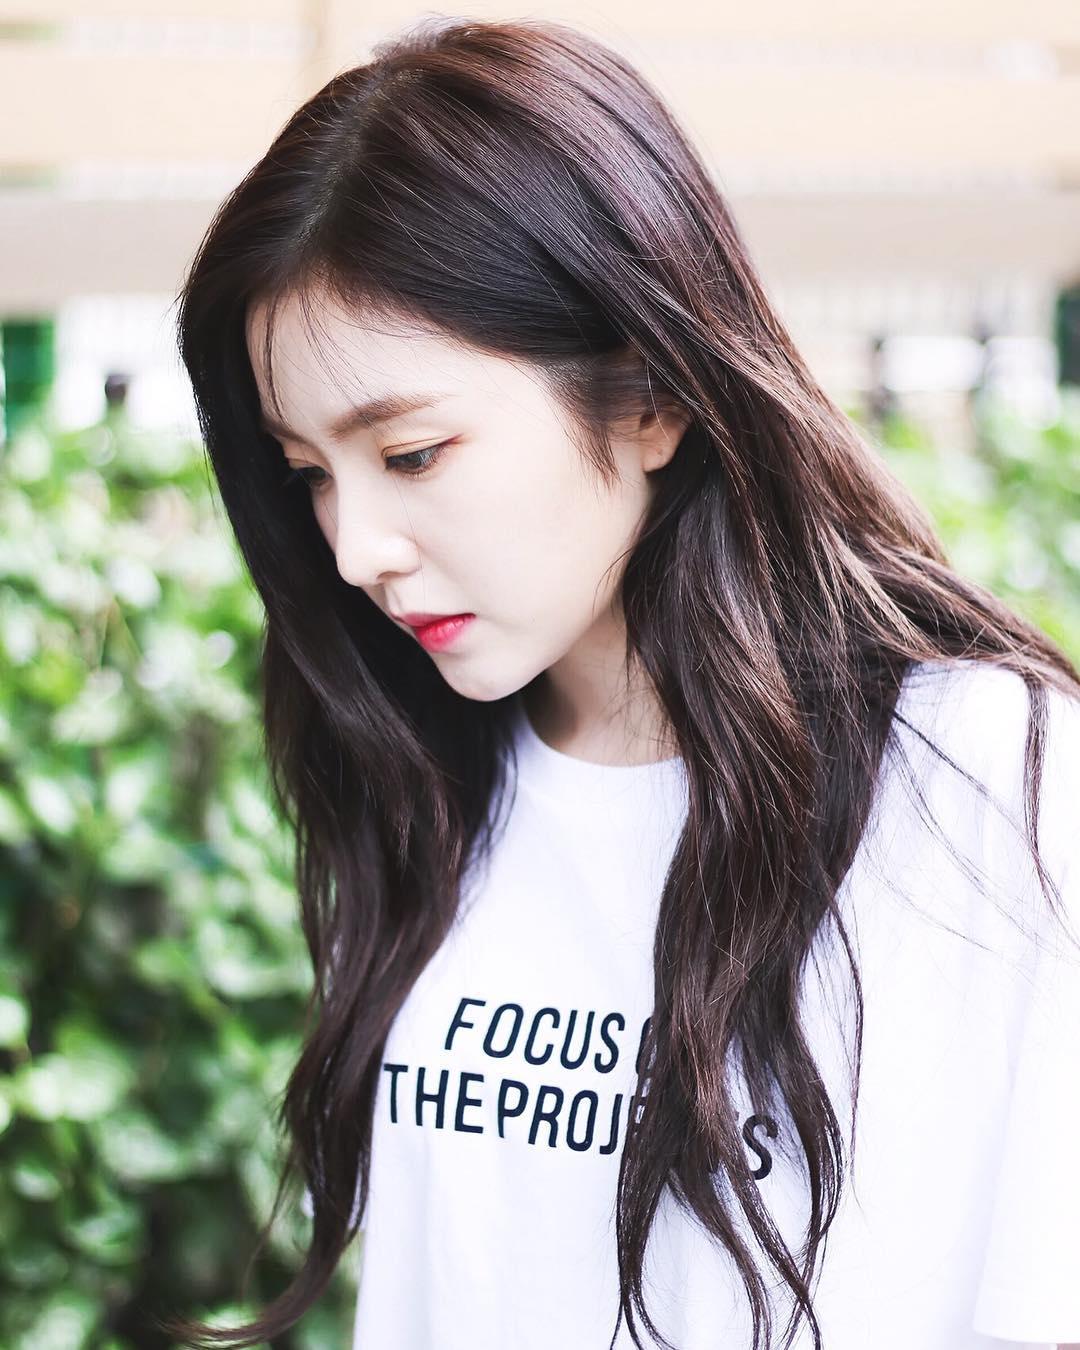 irene side profile, irene jawline, bomi jawline, luda side profile, female idol side profile, female idol jawline, kpop idol jawline